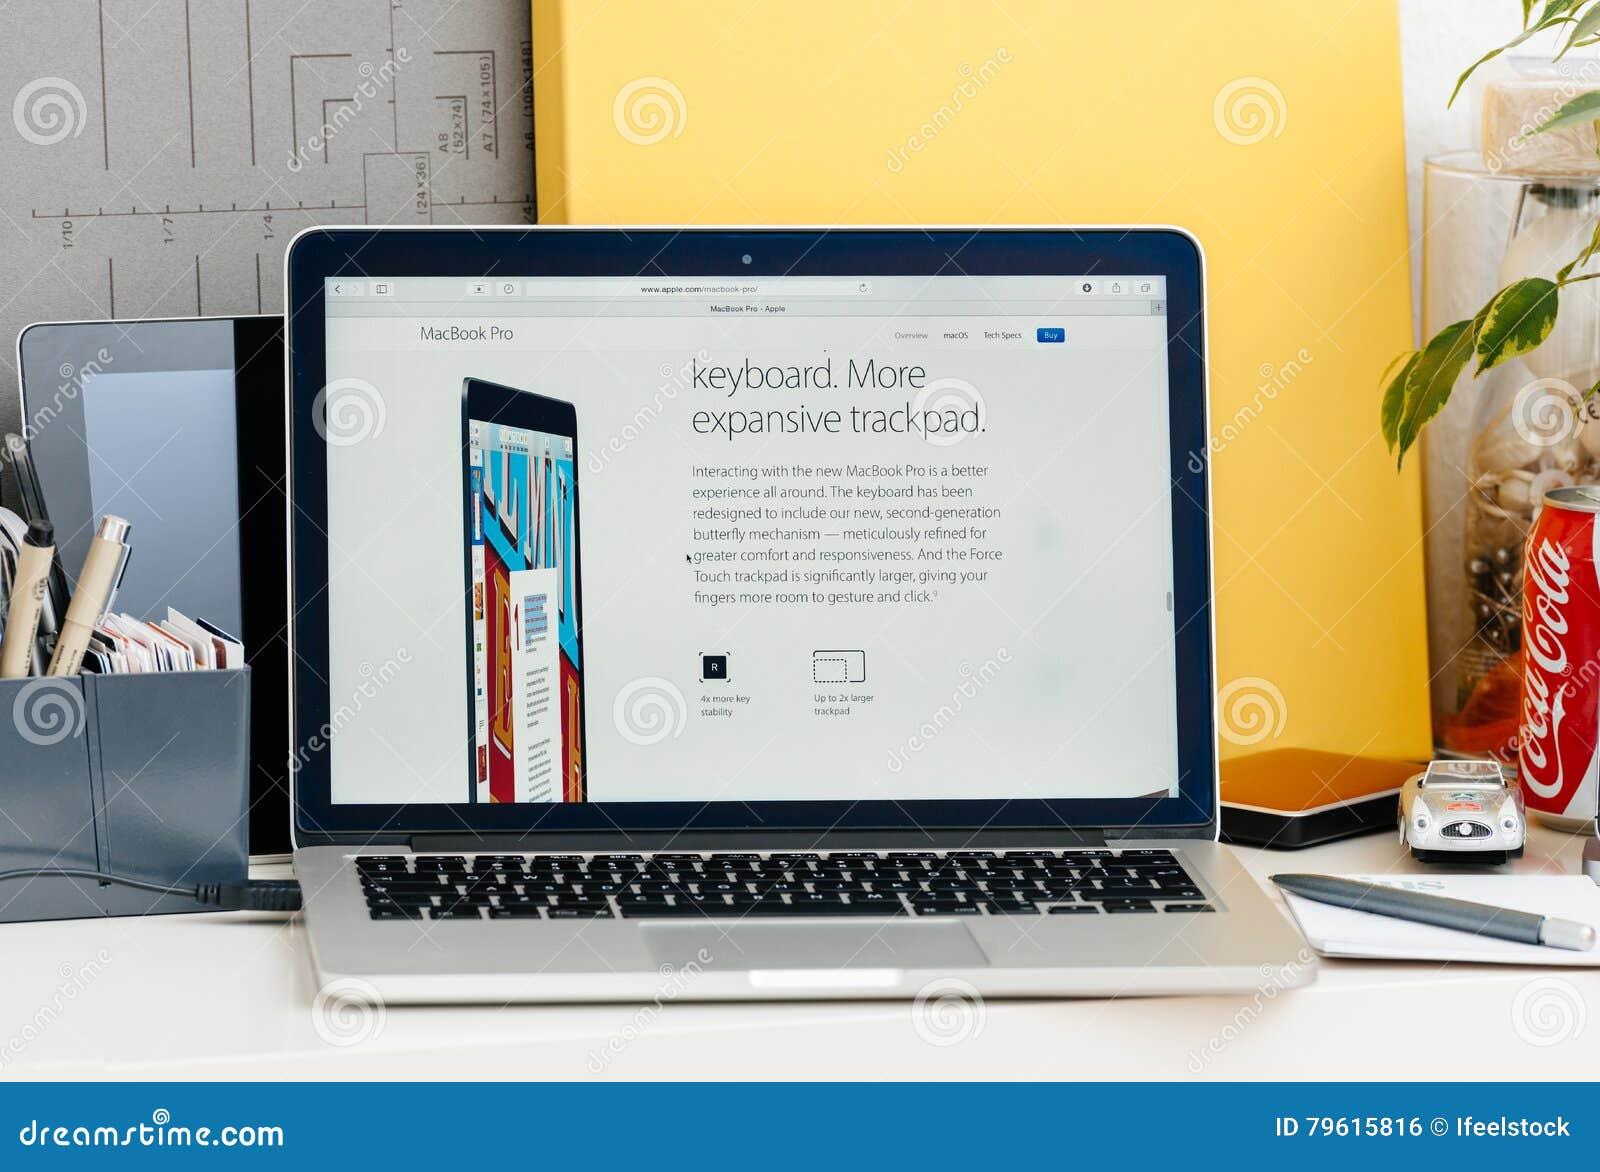 Nieuwe MacBook Pro-retina met aanrakingsbar met nieuw toetsenbord en trac